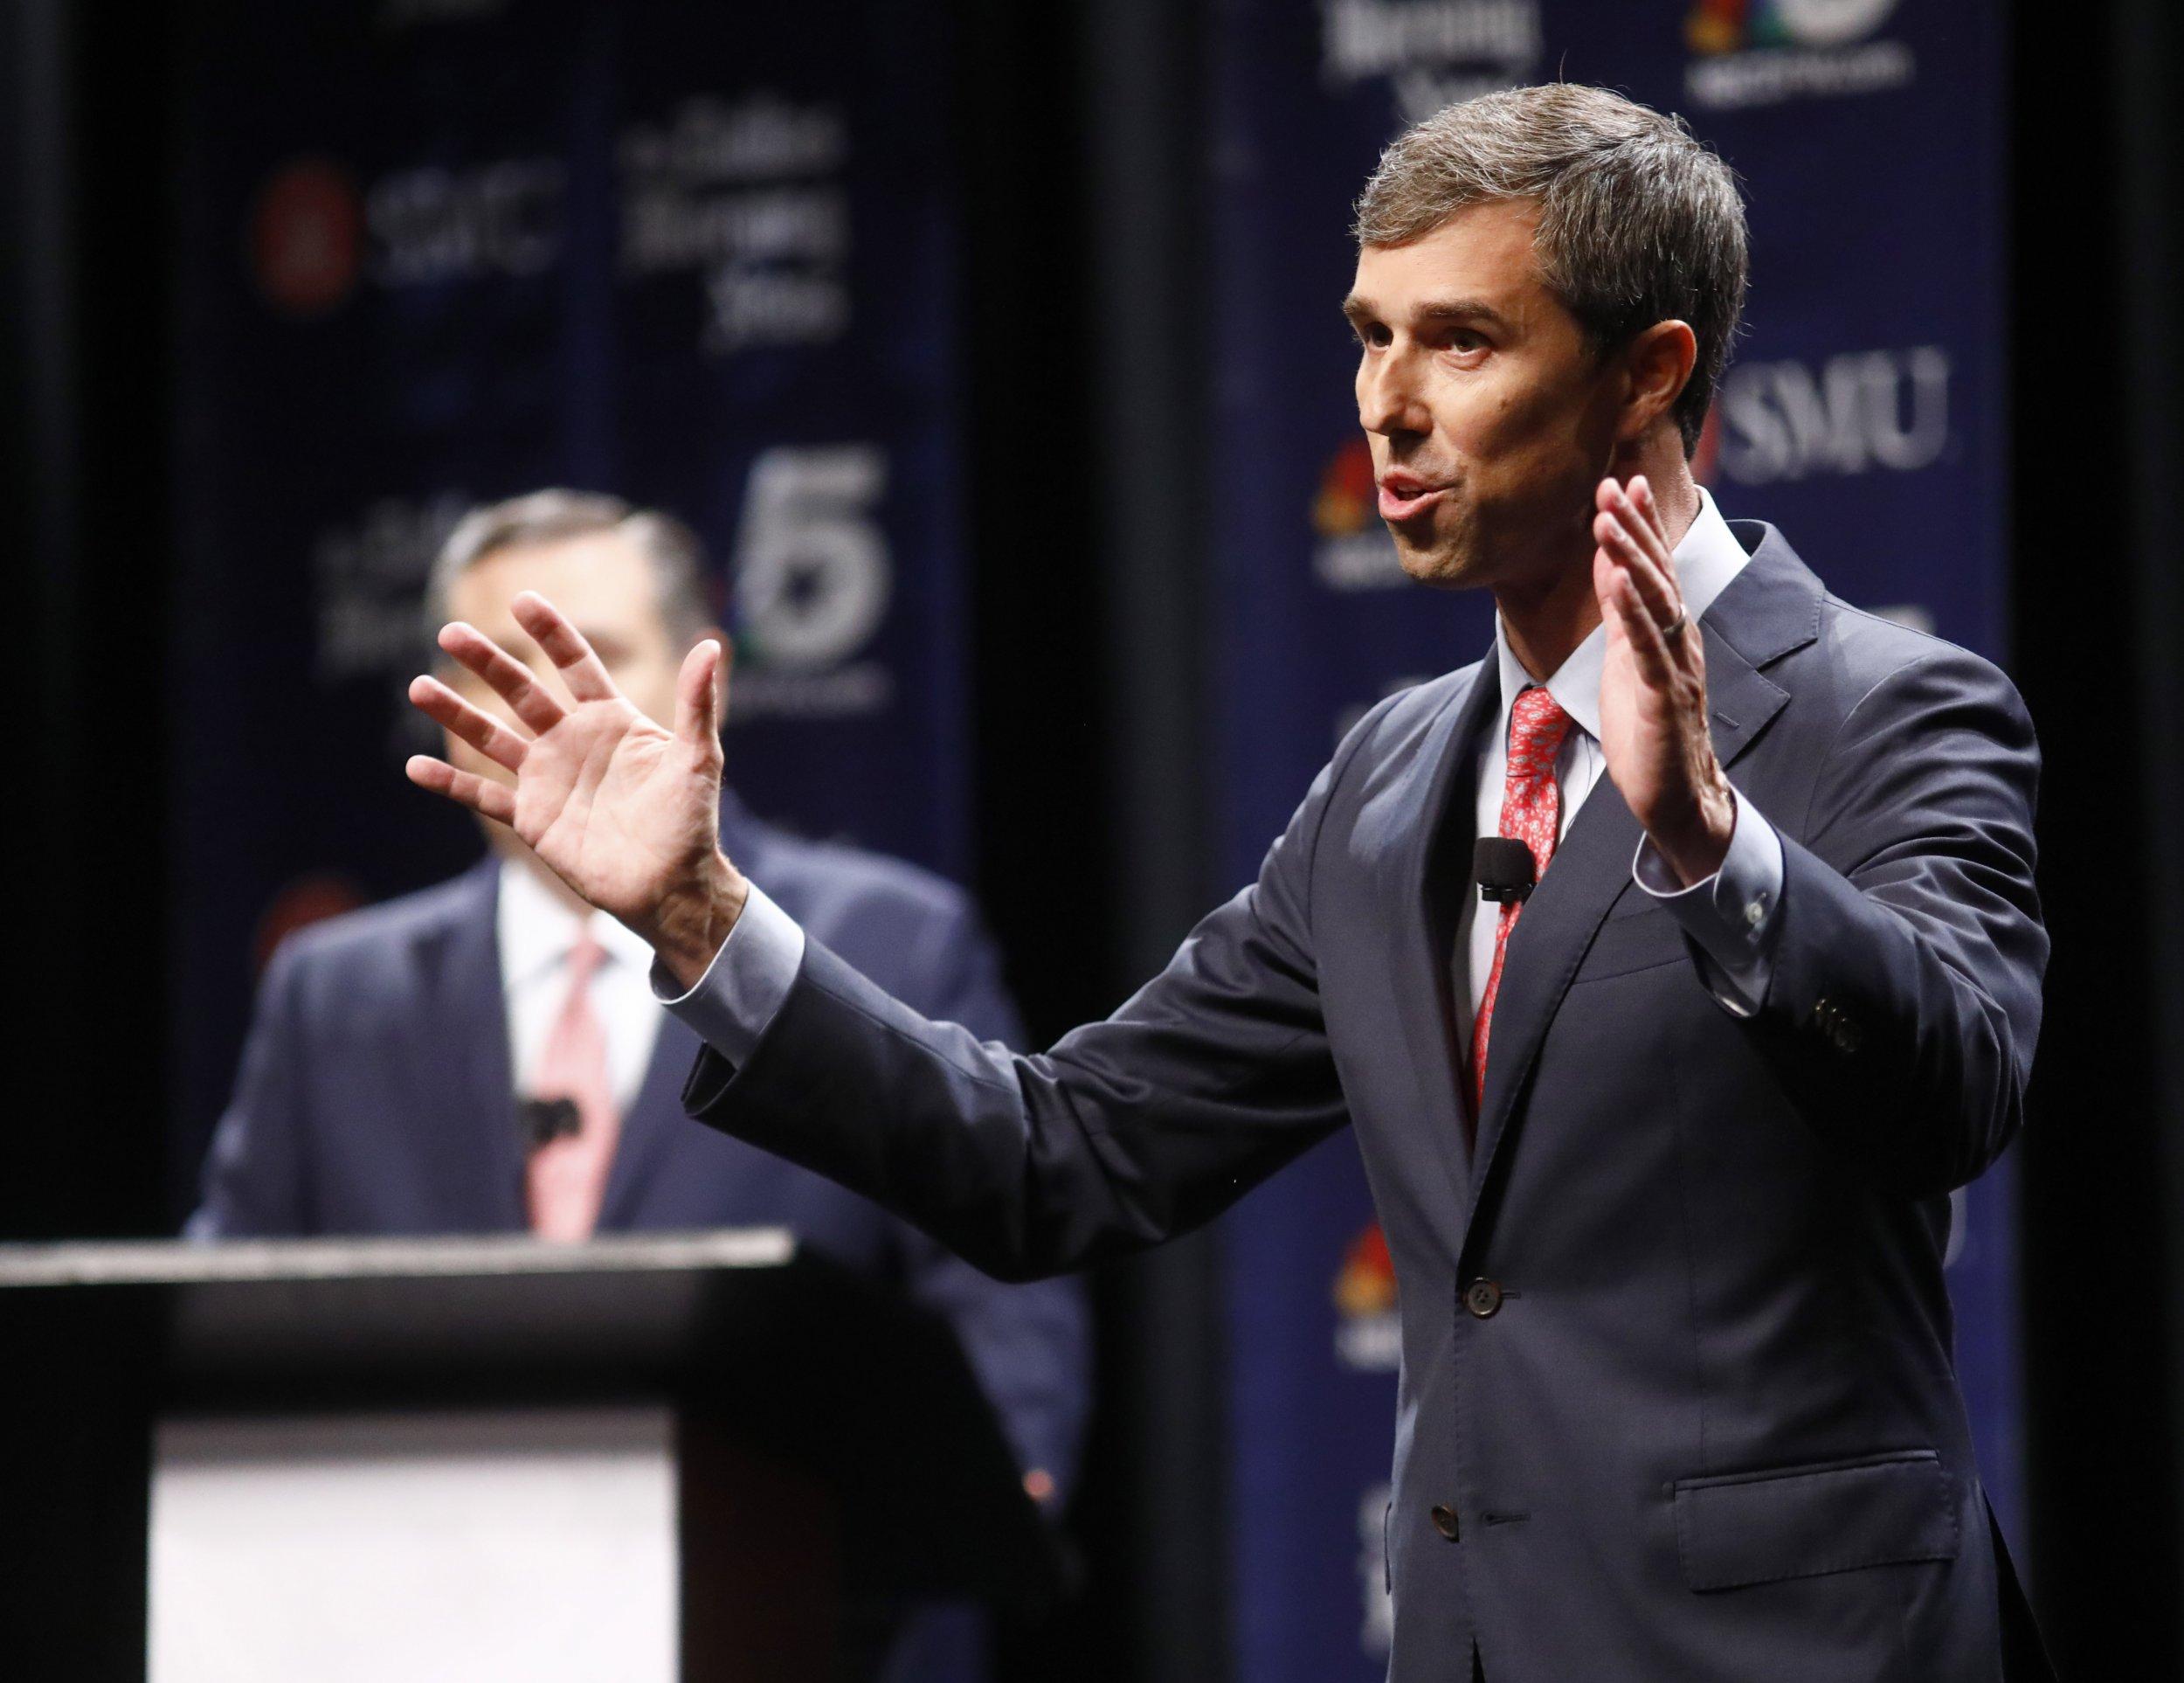 Houston Chronicle Endorses Beto O'Rourke, Breaks From Past Conservative Endorsements